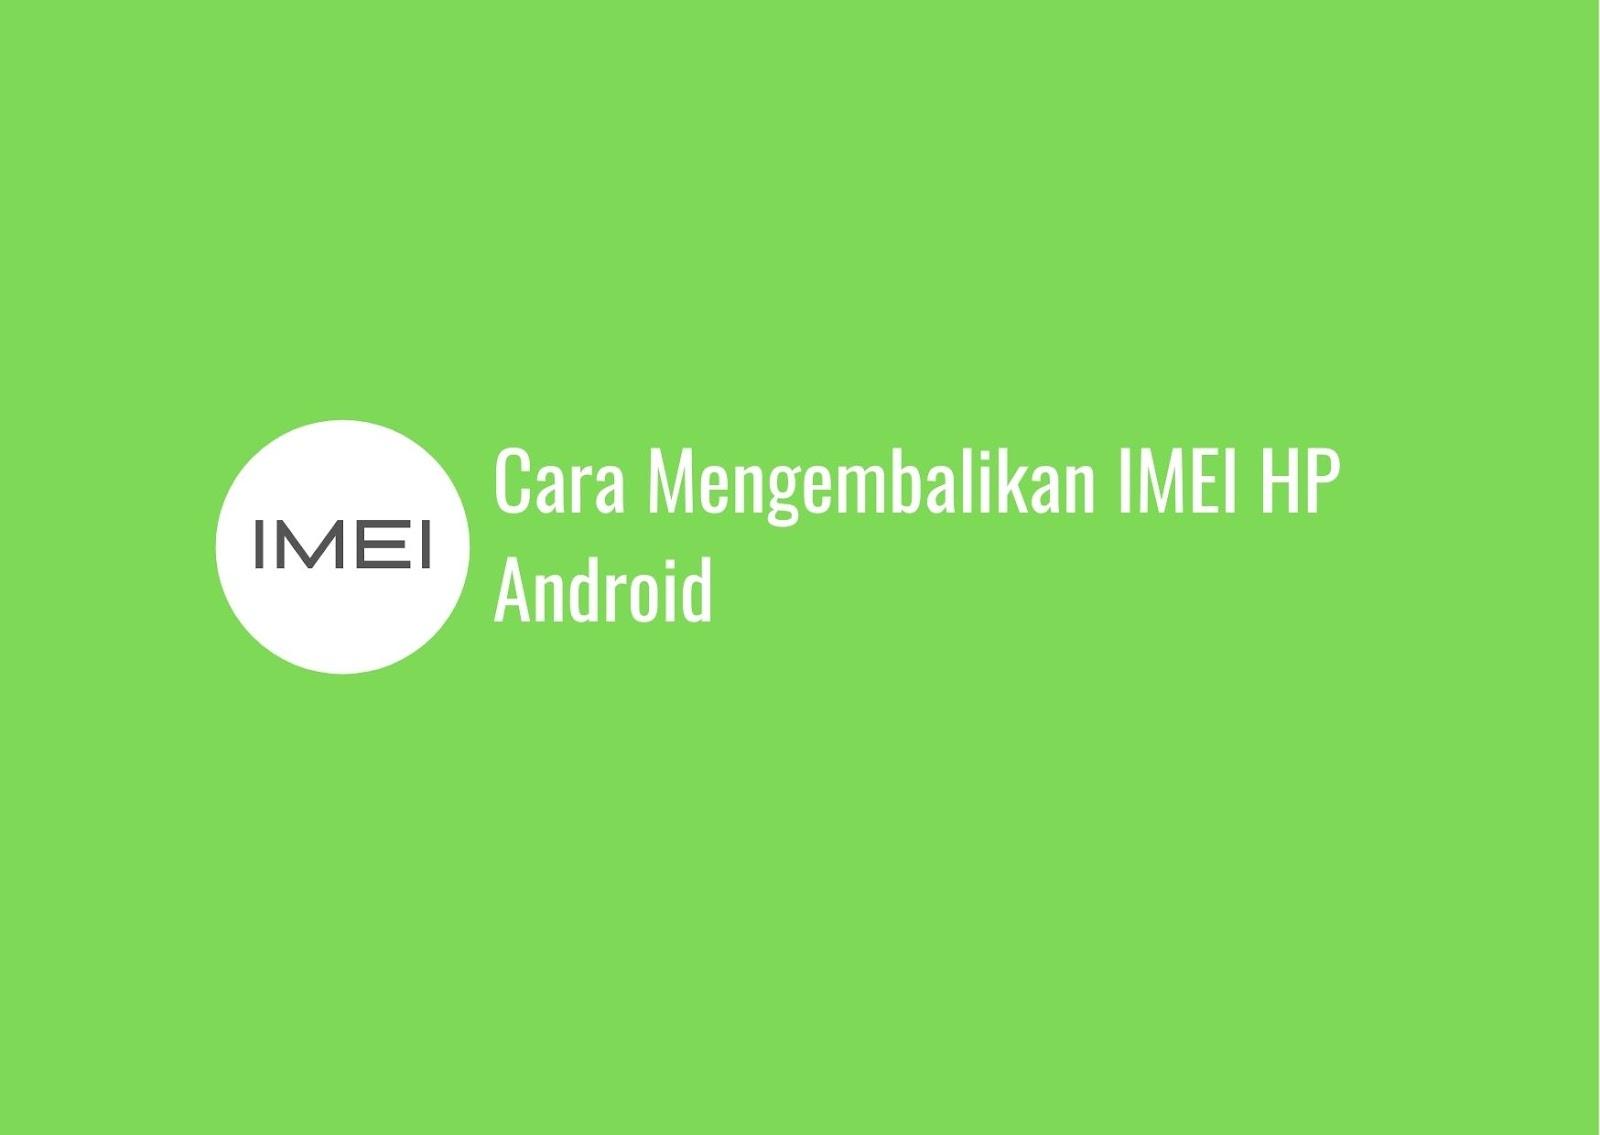 Cara Mengembalikan IMEI HP Android